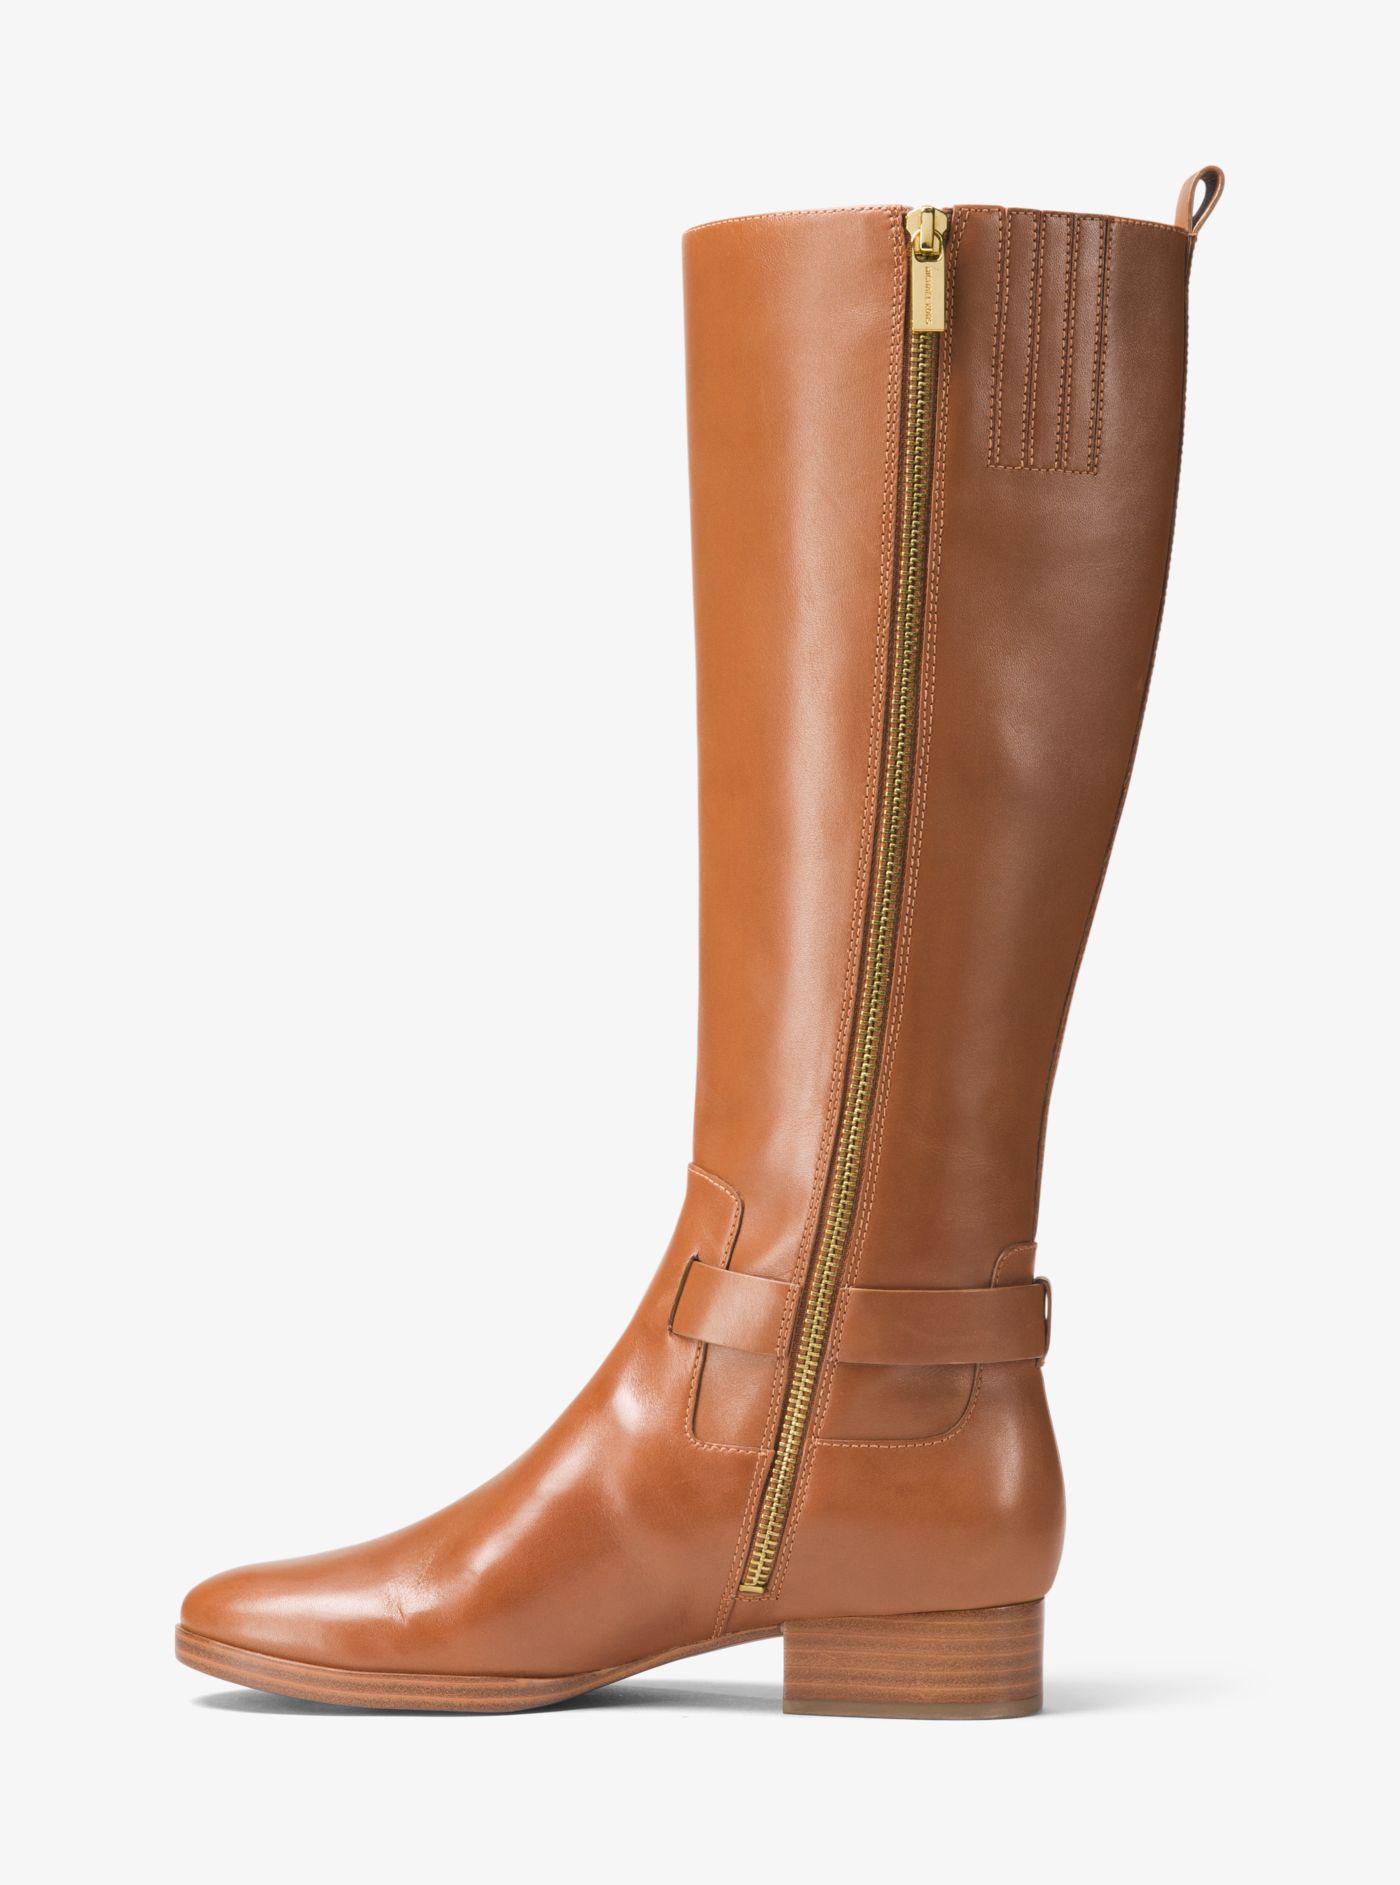 Michael Kors Ryan Leather Boot in Brown